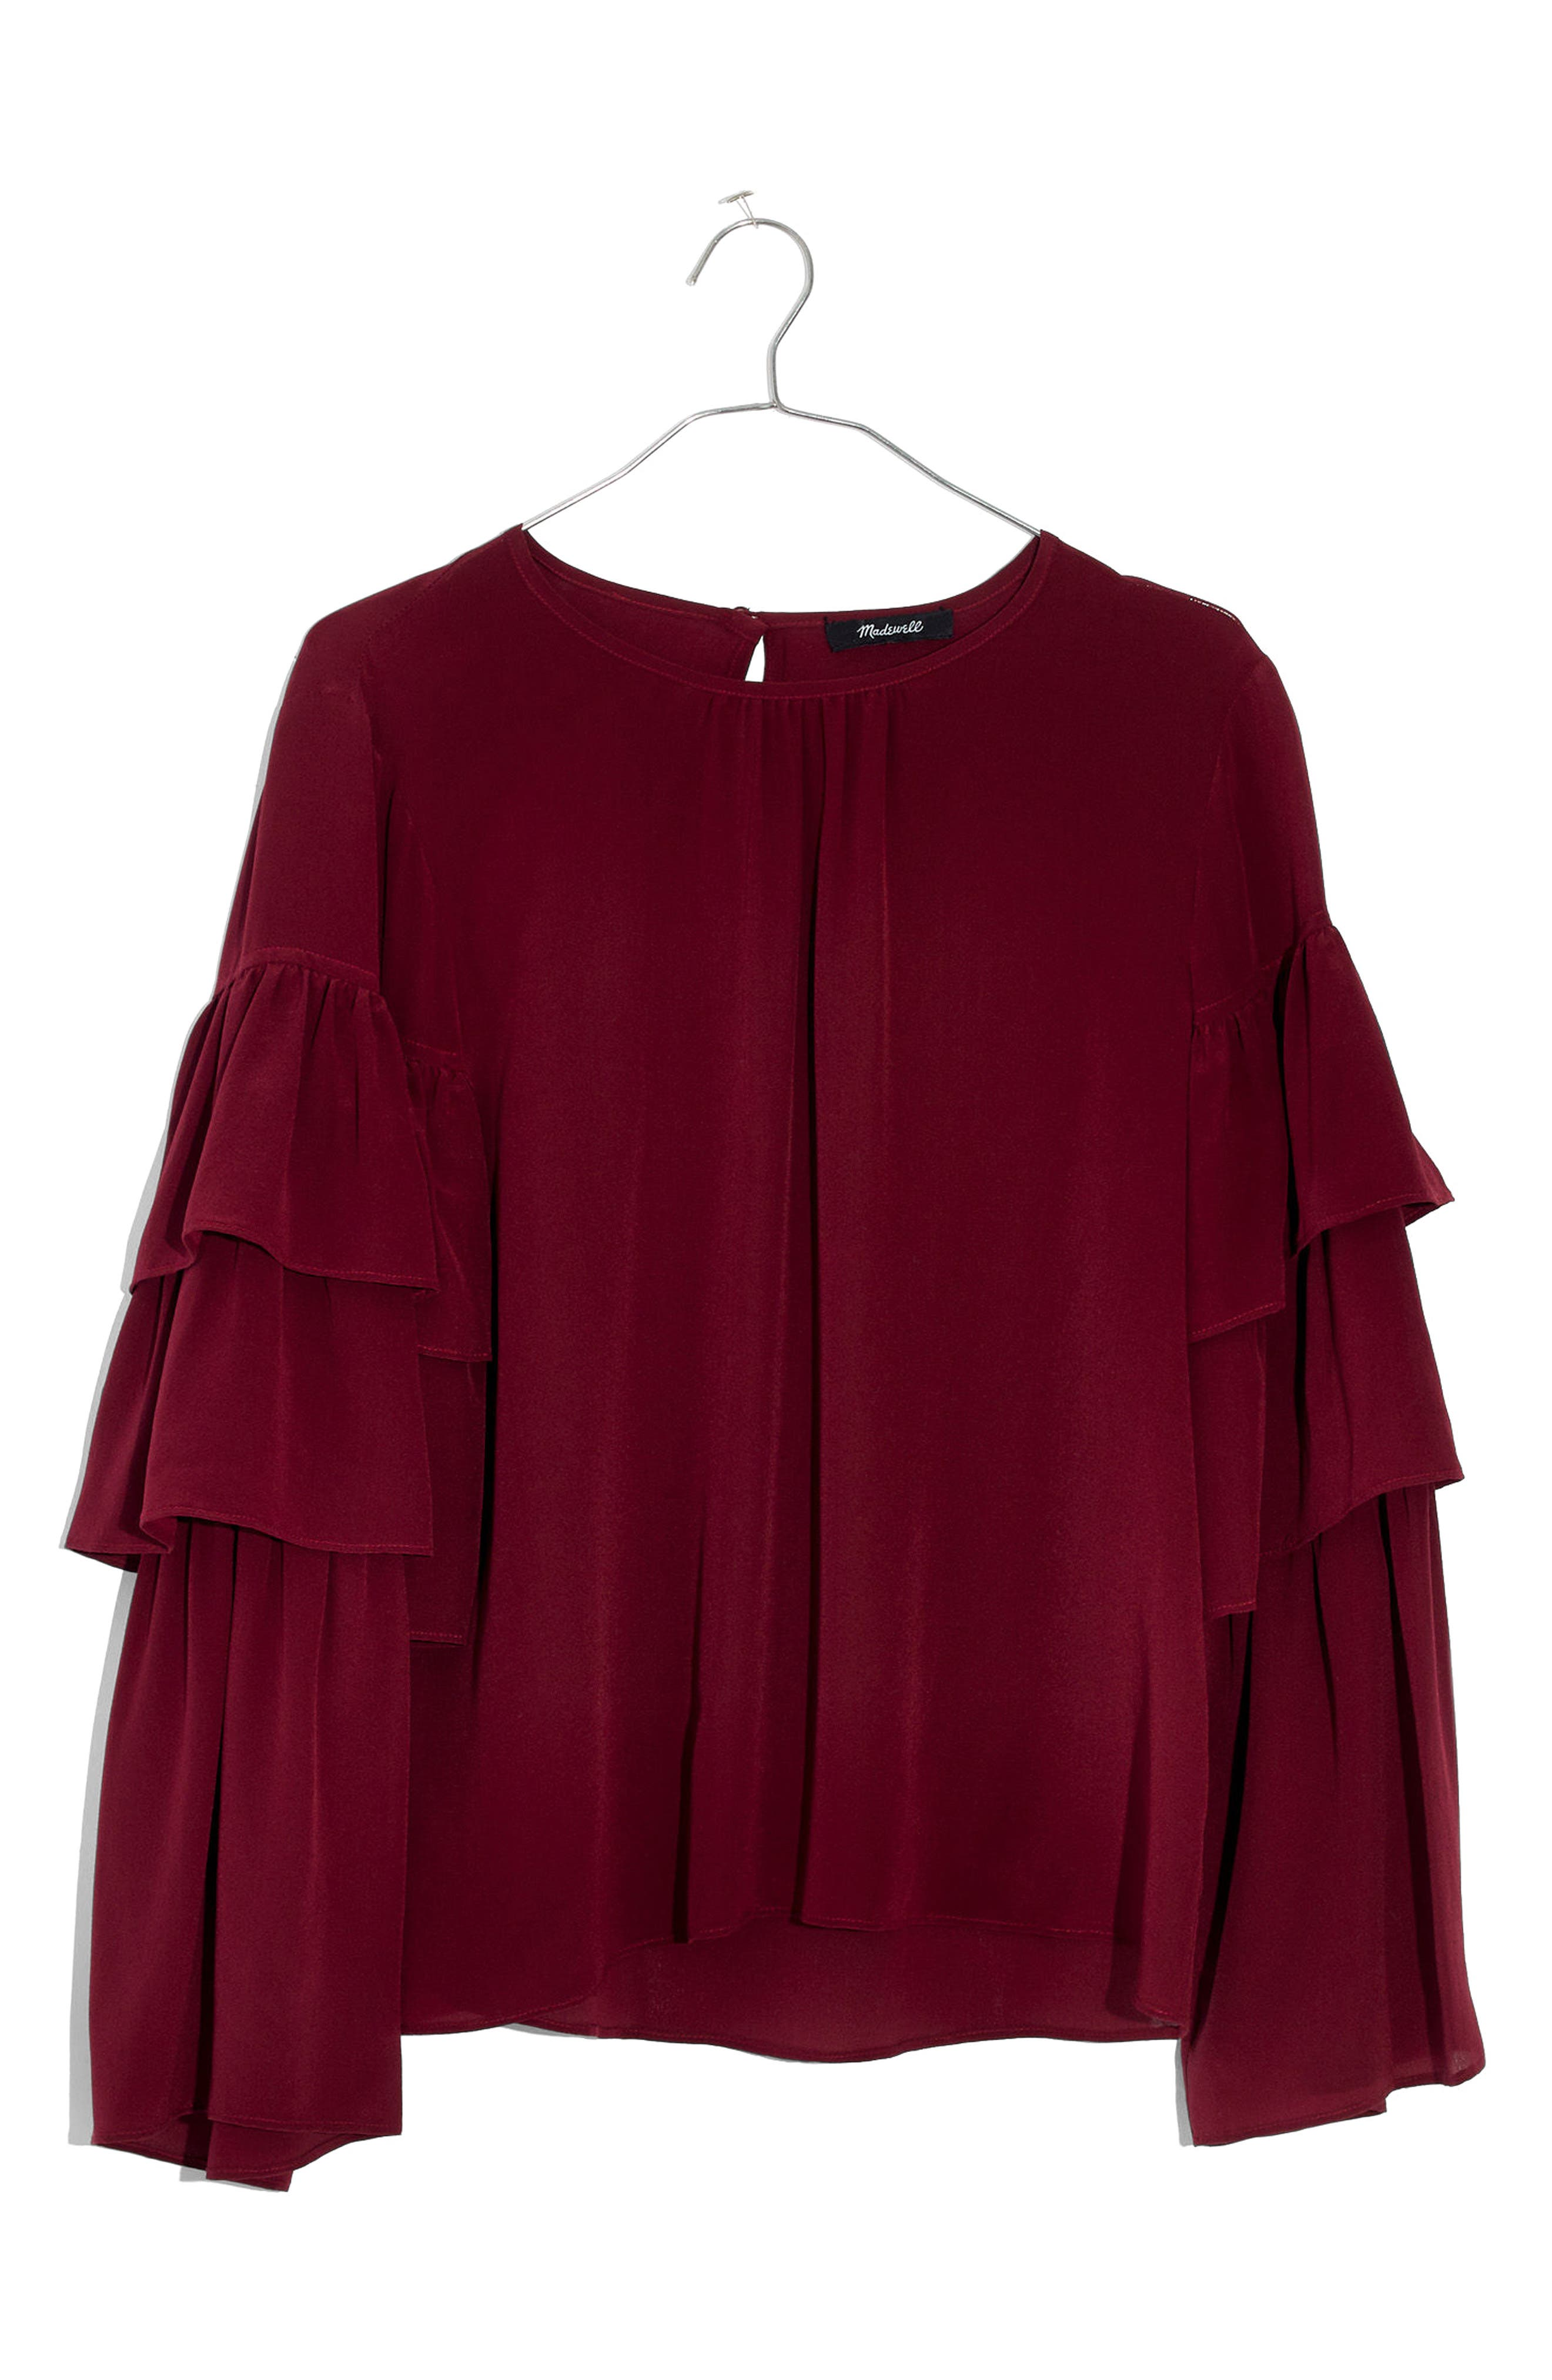 Main Image - Madewell Ruffle Sleeve Silk Top